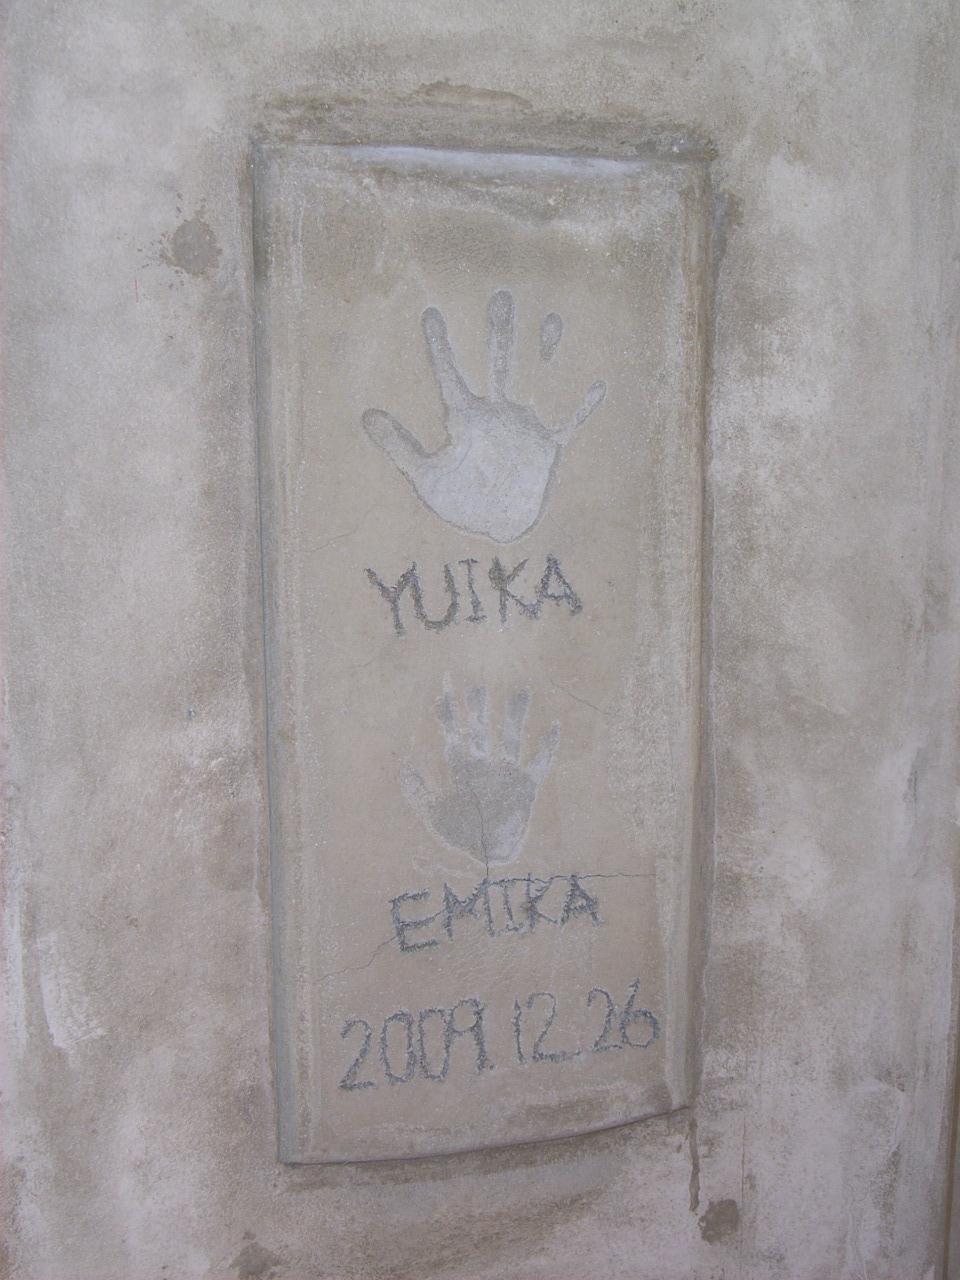 20091229 006